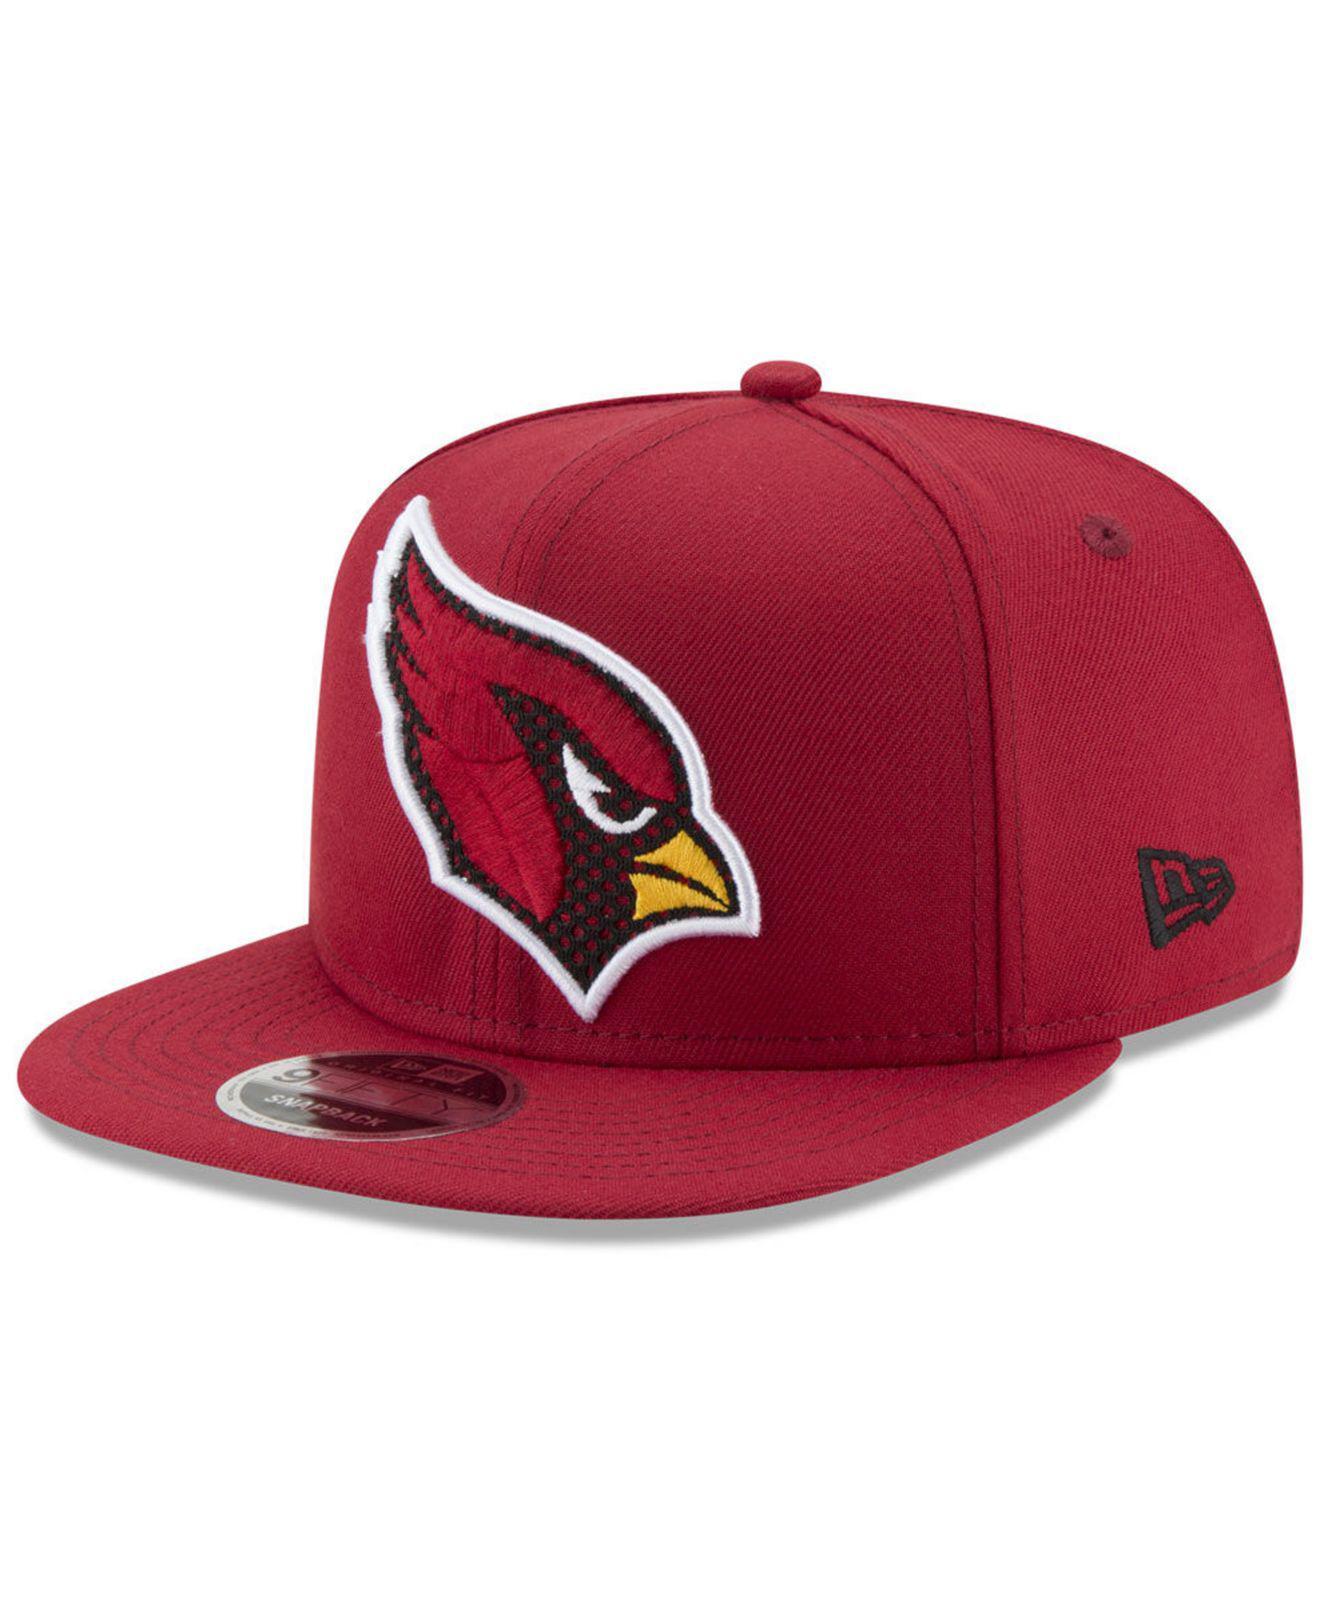 info for 38b16 00c61 KTZ. Men s Red Arizona Cardinals Meshed Mix 9fifty Snapback Cap